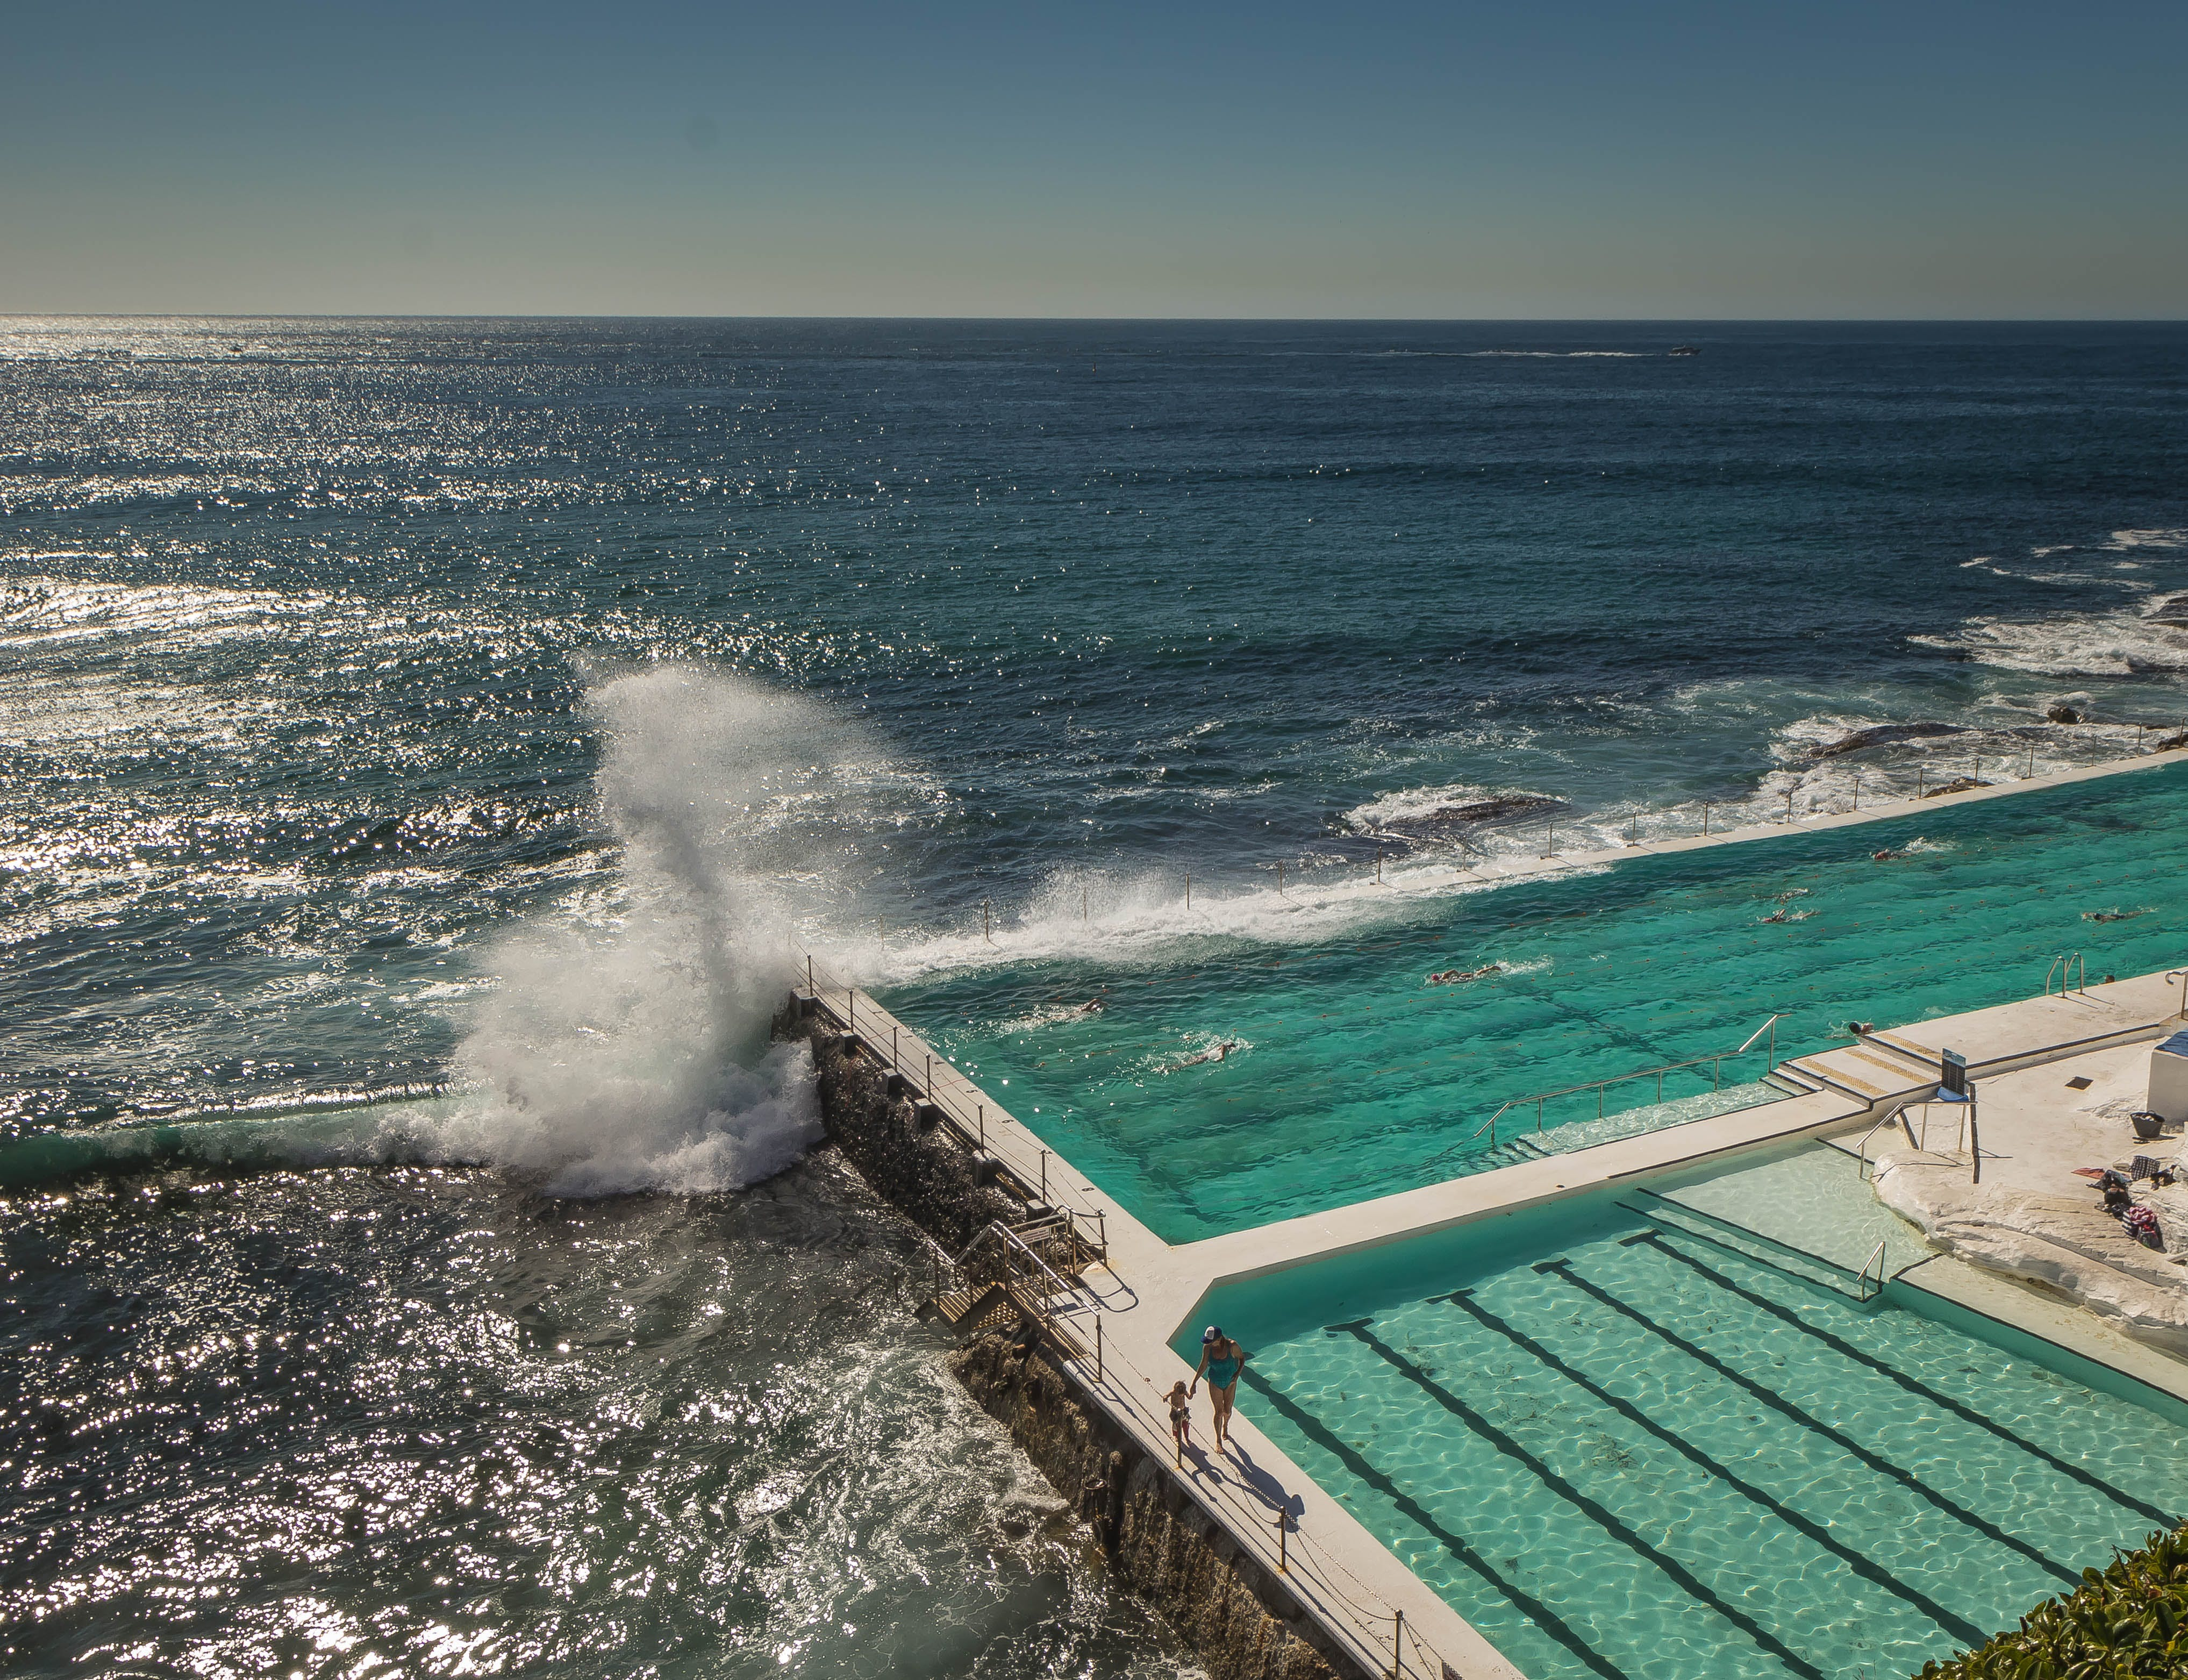 Free stock photo of beach, Bondi Beach, icebergs, pool